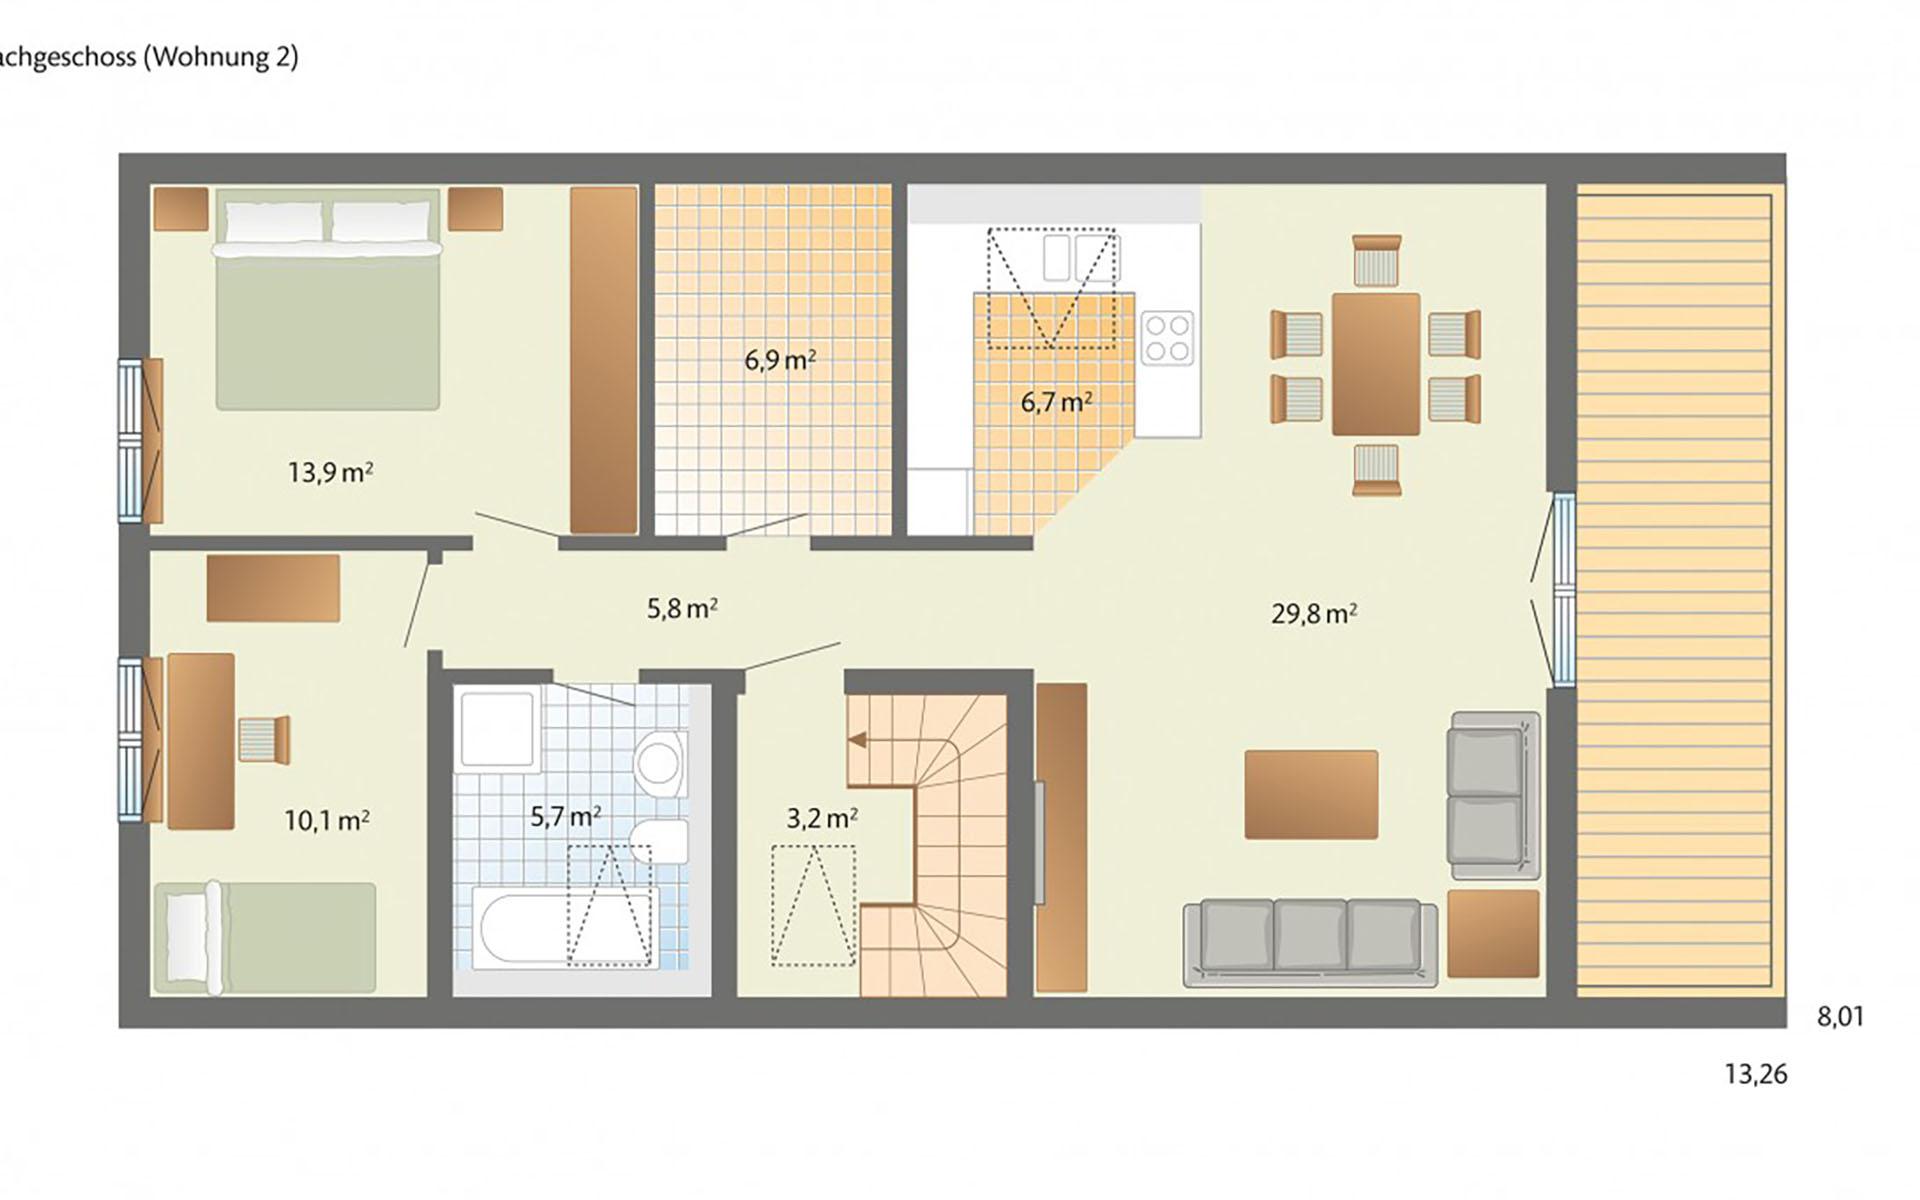 Dachgeschoss Helsinki von Danhaus GmbH